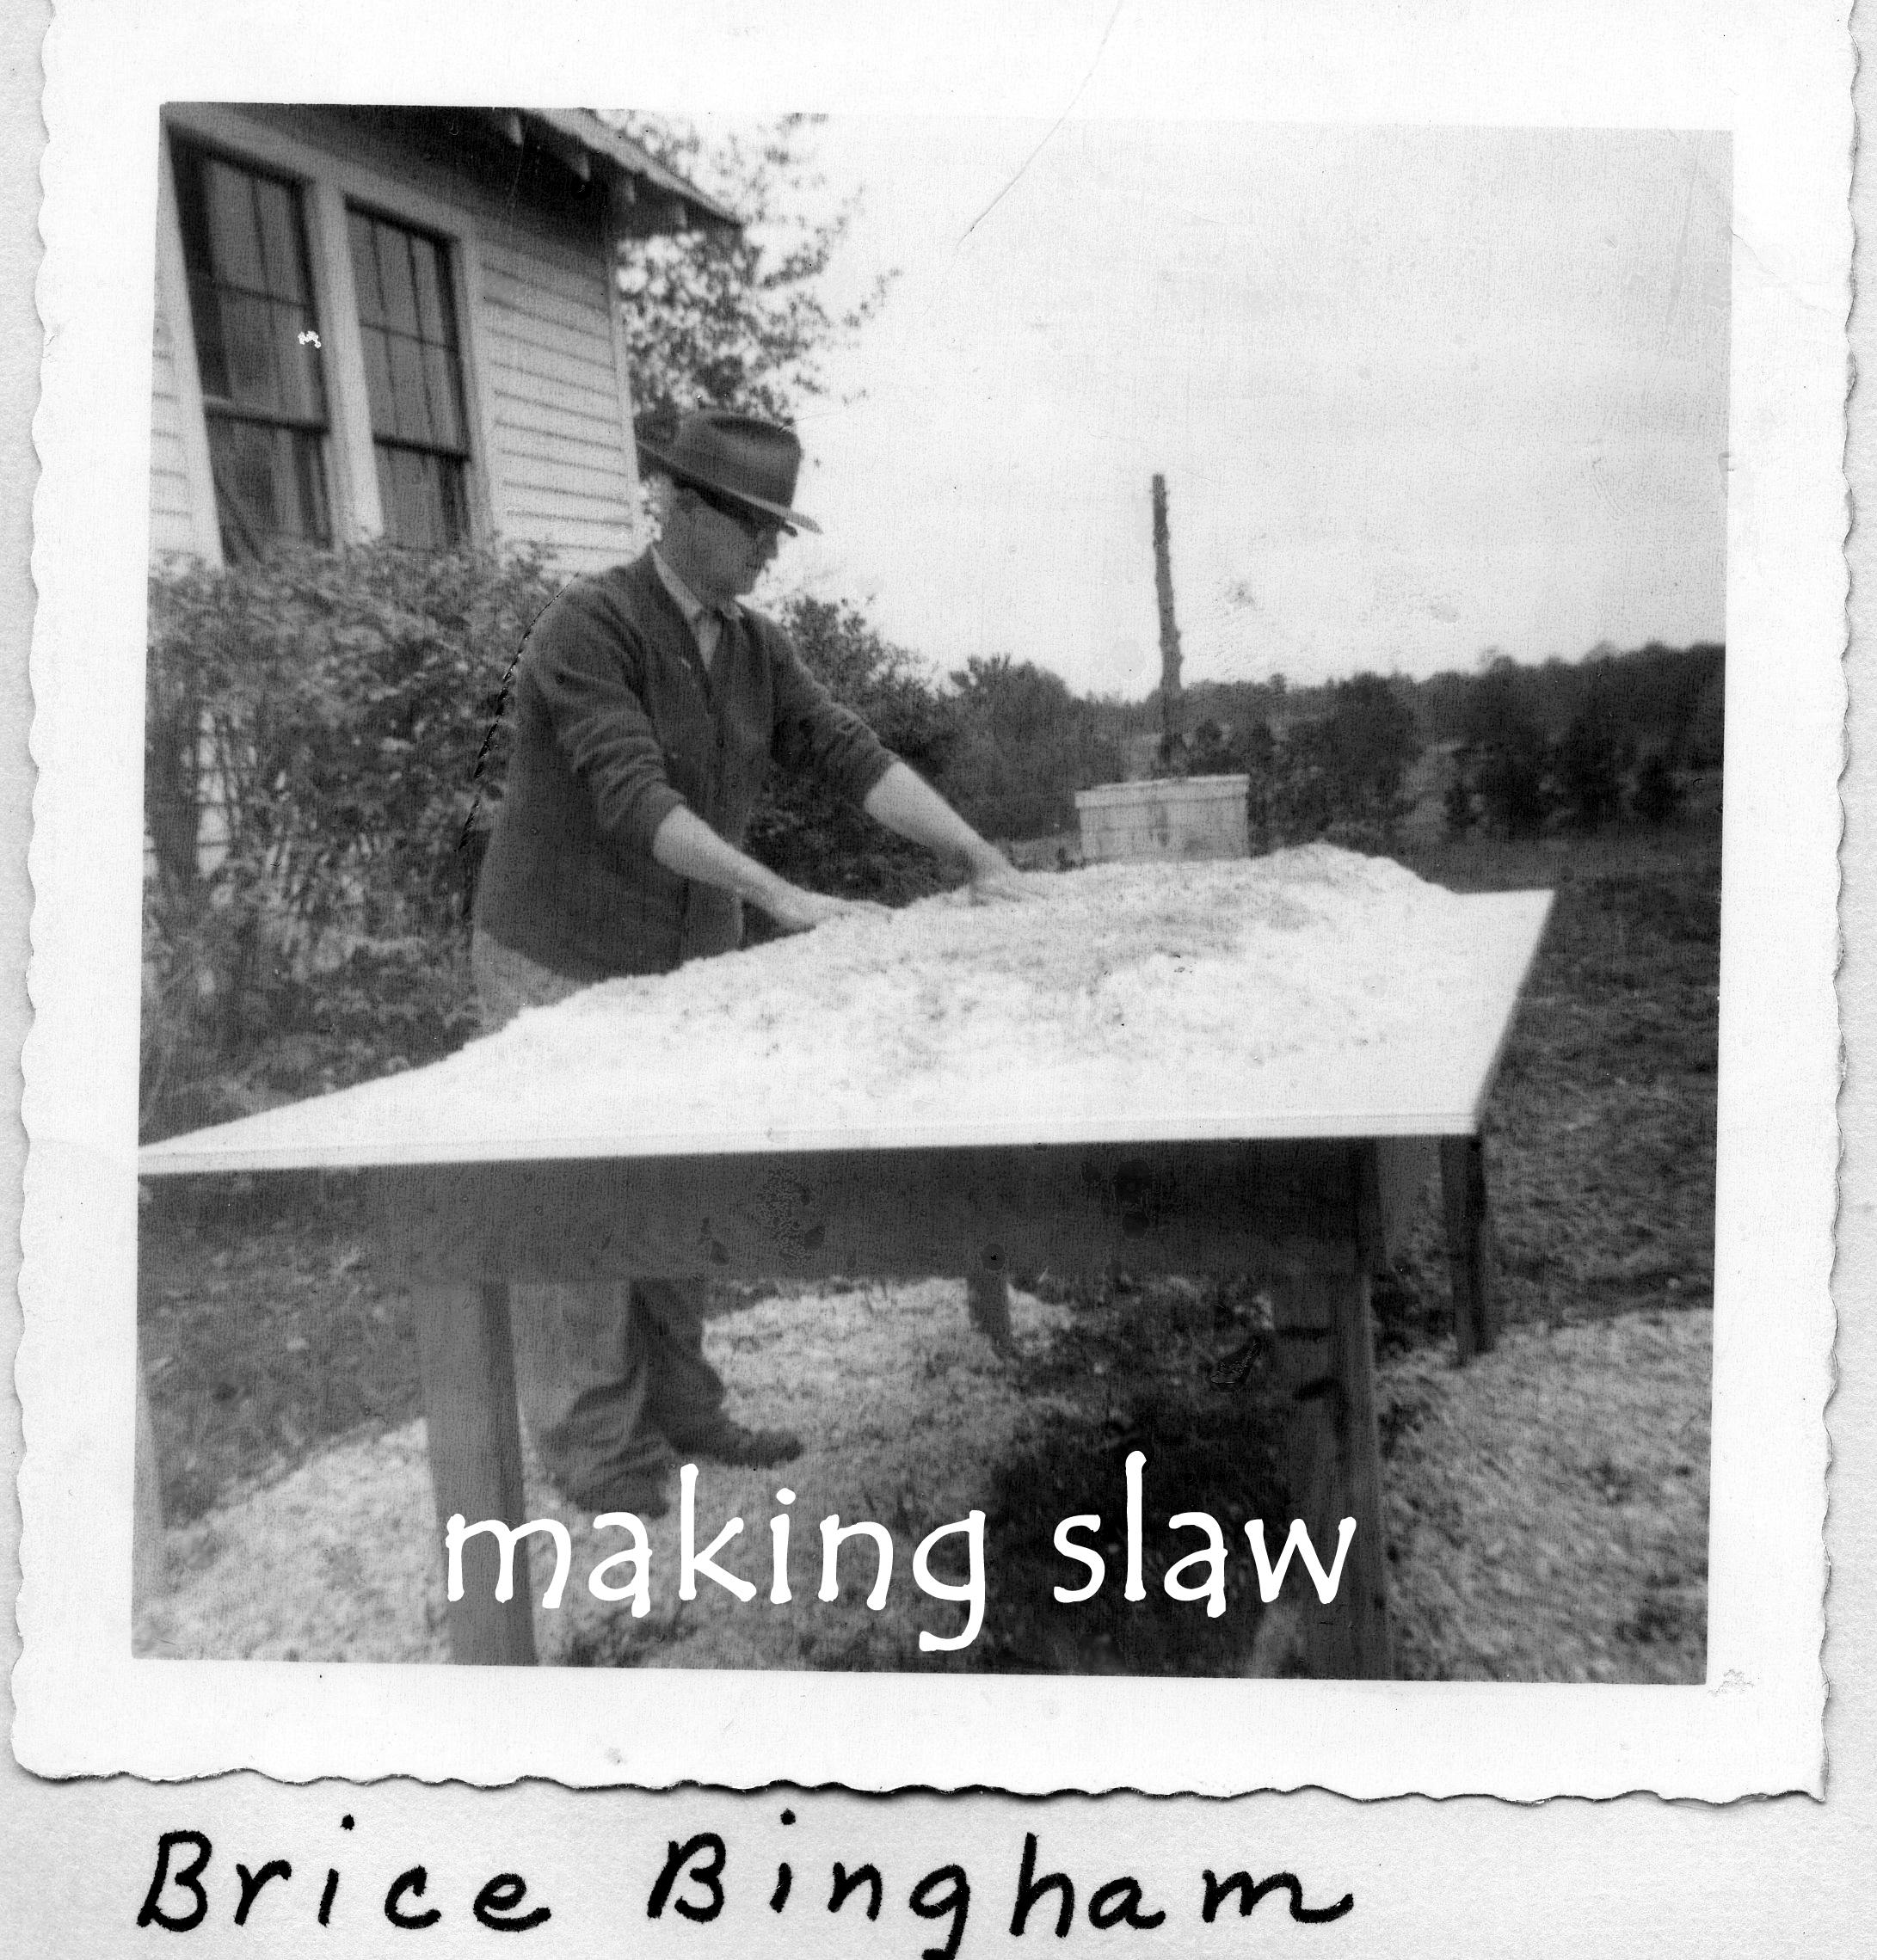 Brice Bingham138